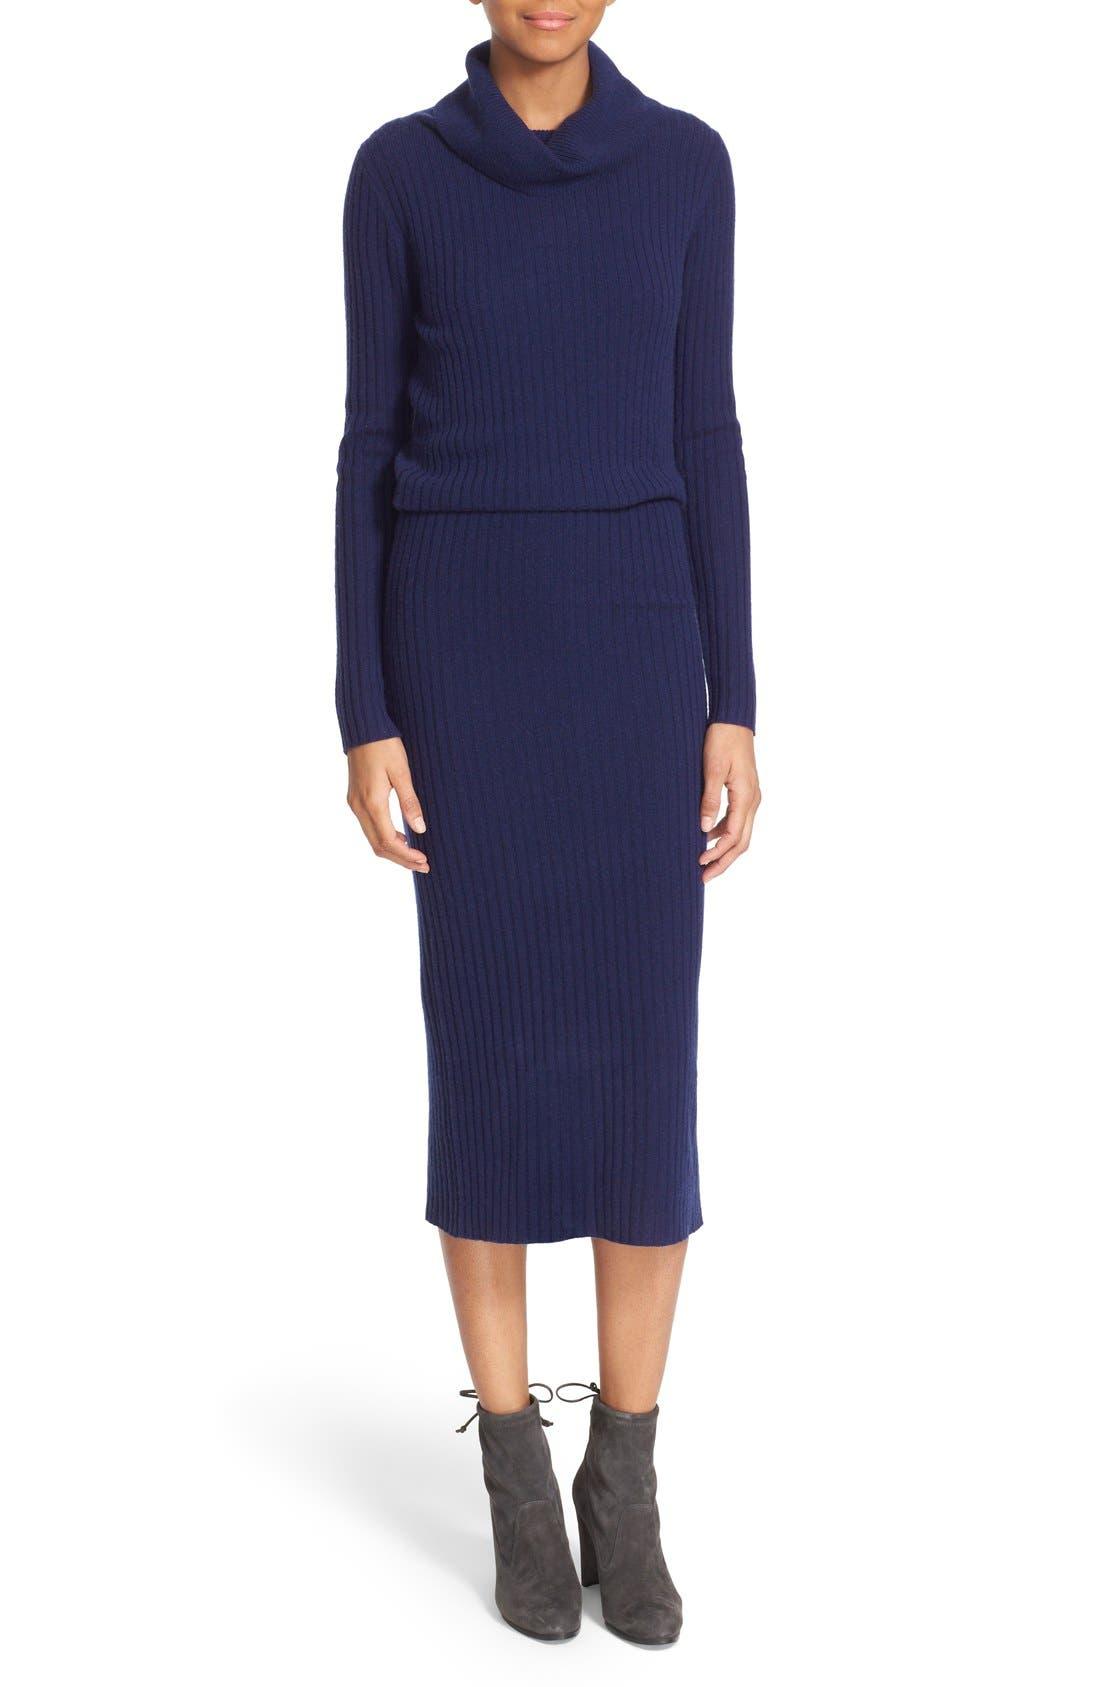 Alternate Image 1 Selected - Alice + Olivia 'Hailee' Cowl Neck Blouson Sweater Dress